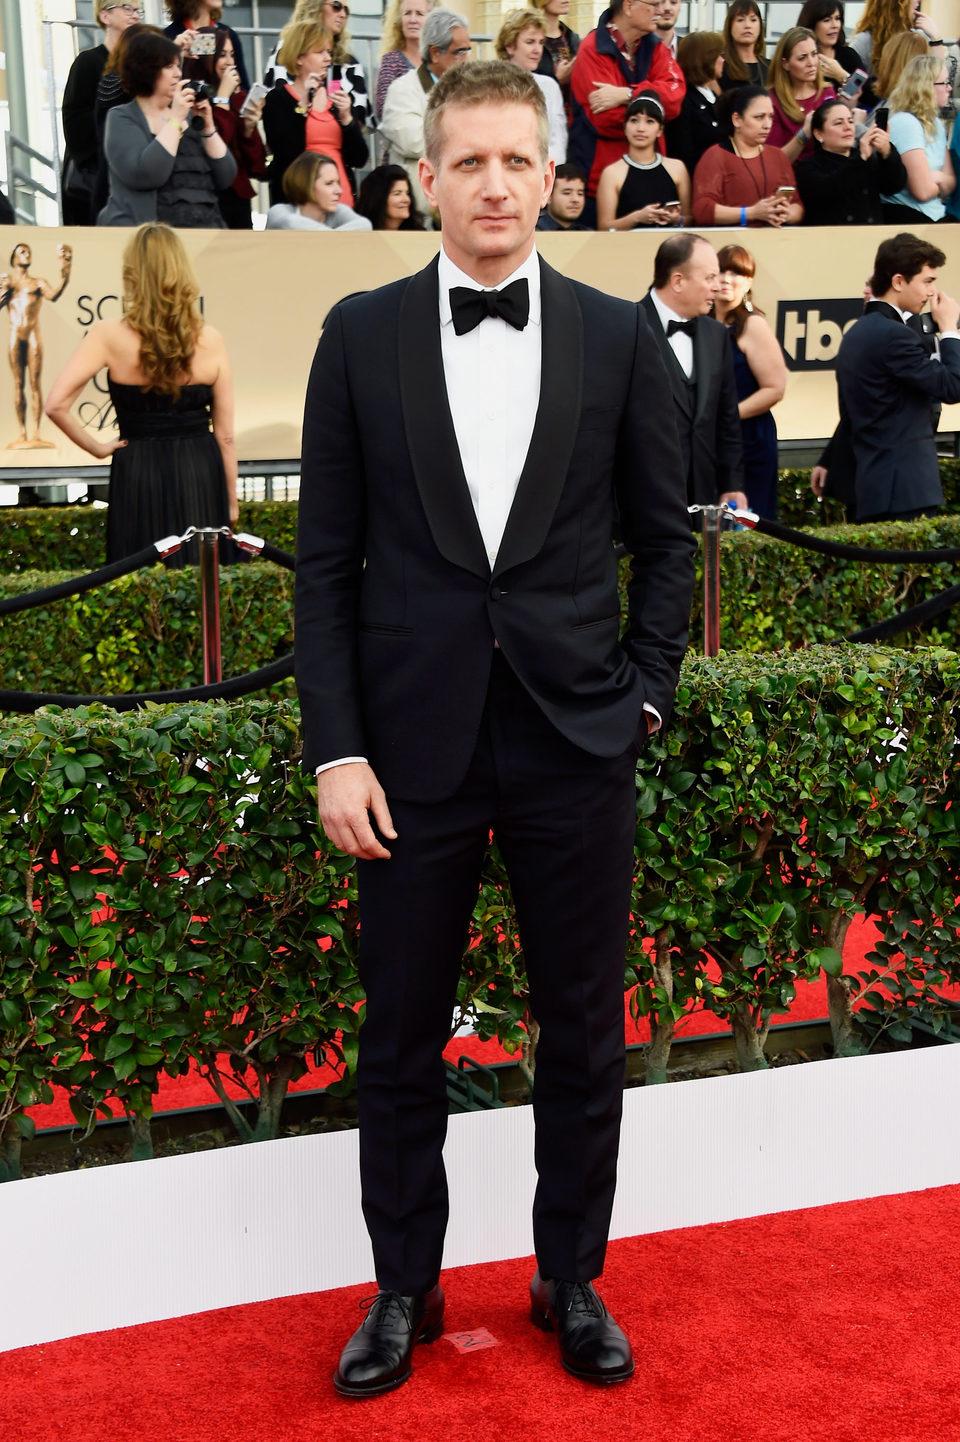 Paul Sparks in red carpet of SAG Awards 2016